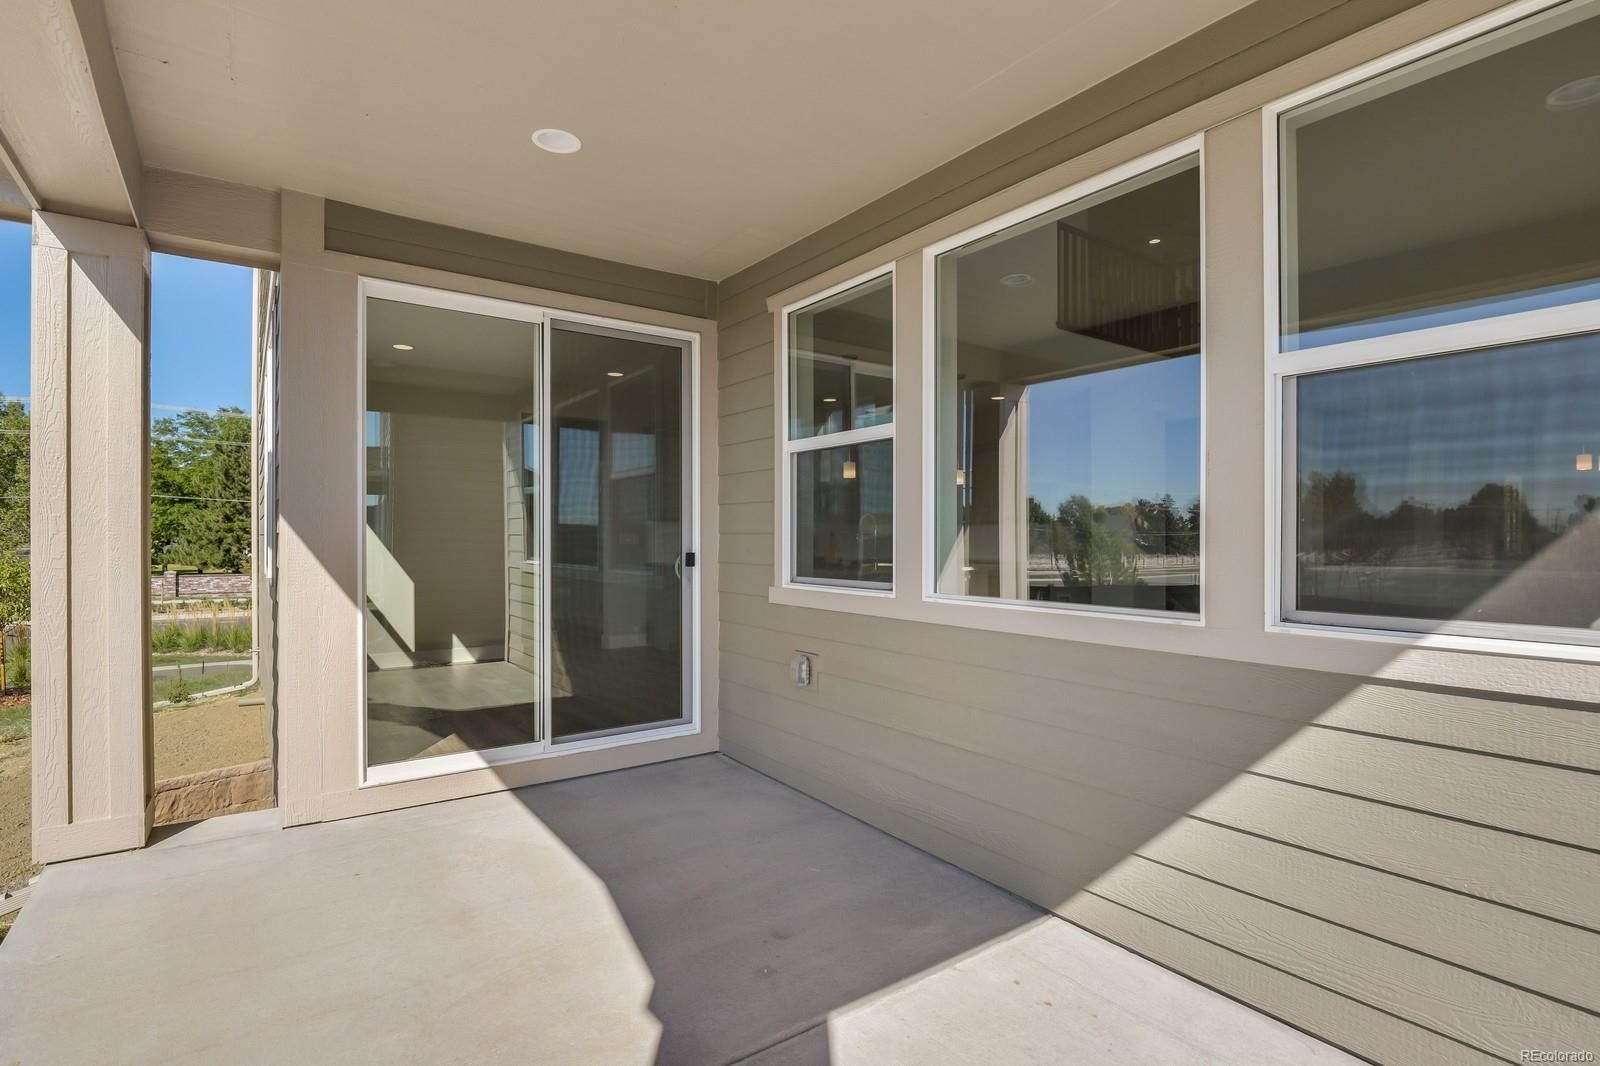 MLS# 2526502 - 17 - 3924 Owl Creek Court, Loveland, CO 80538